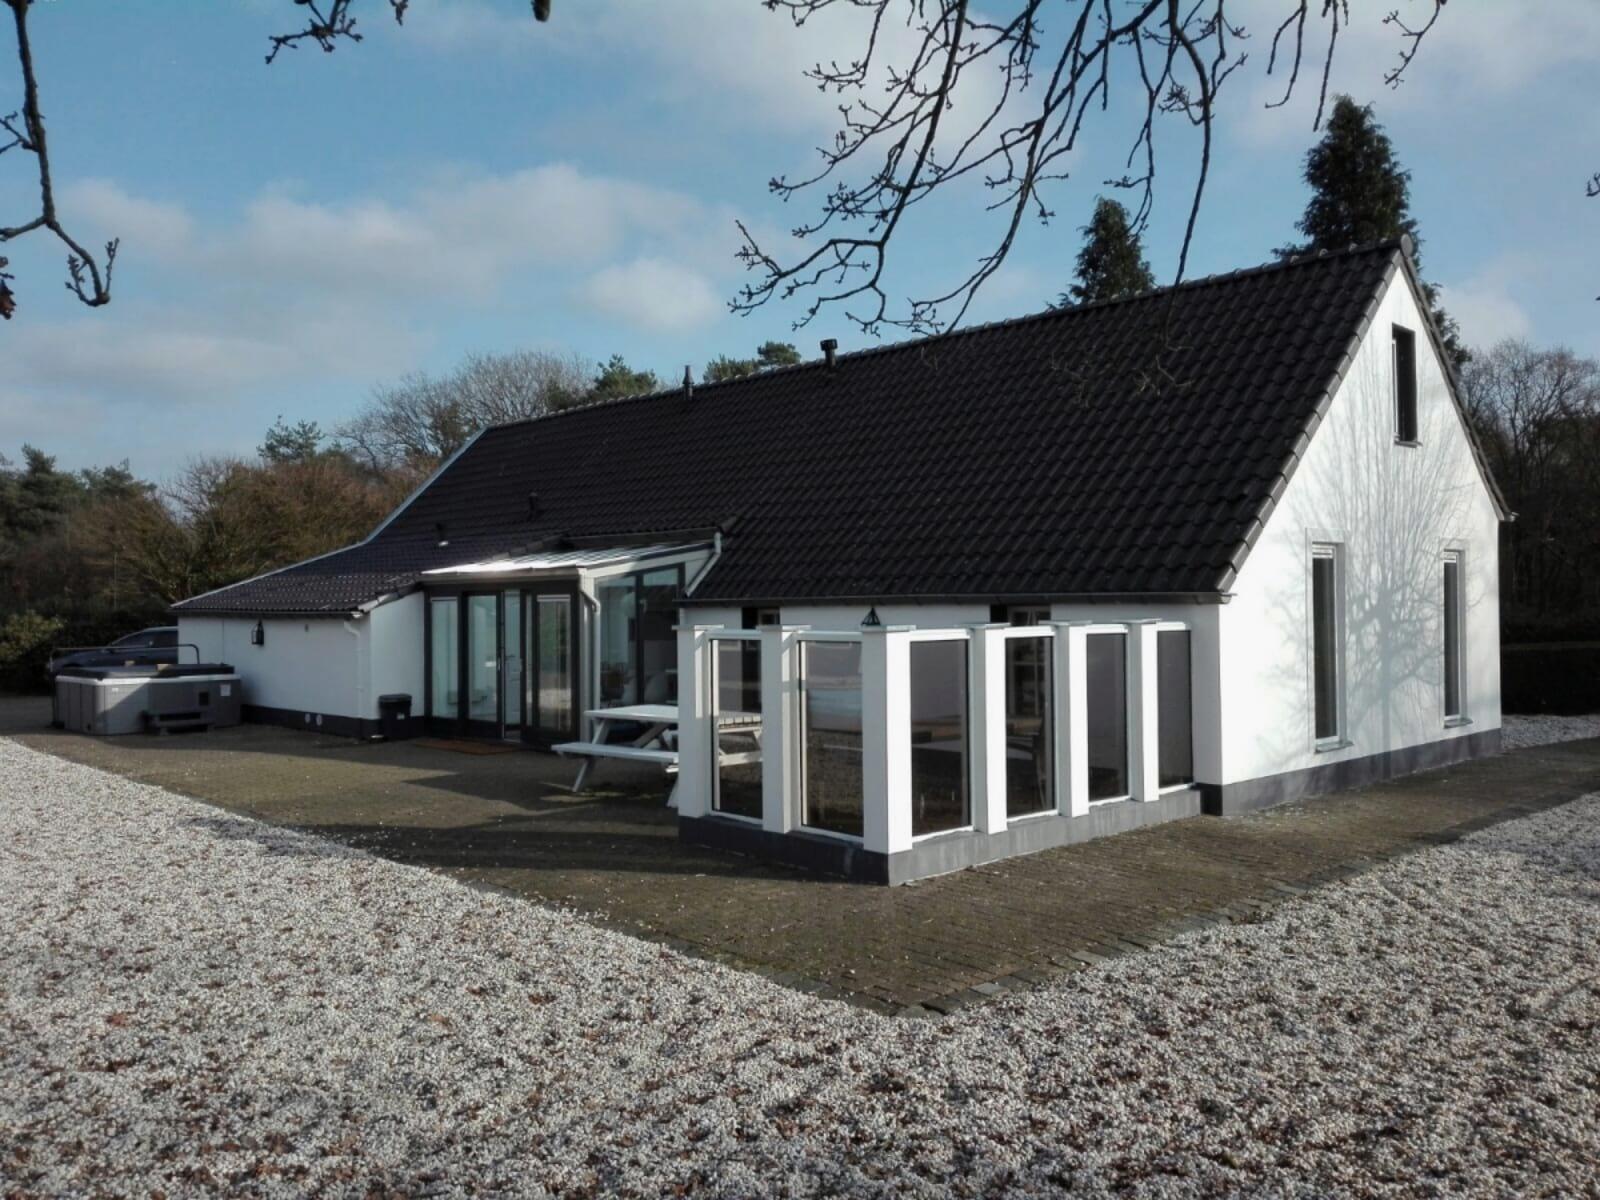 Supertrips - Luxe vakantiewoning Limburg met zwembad